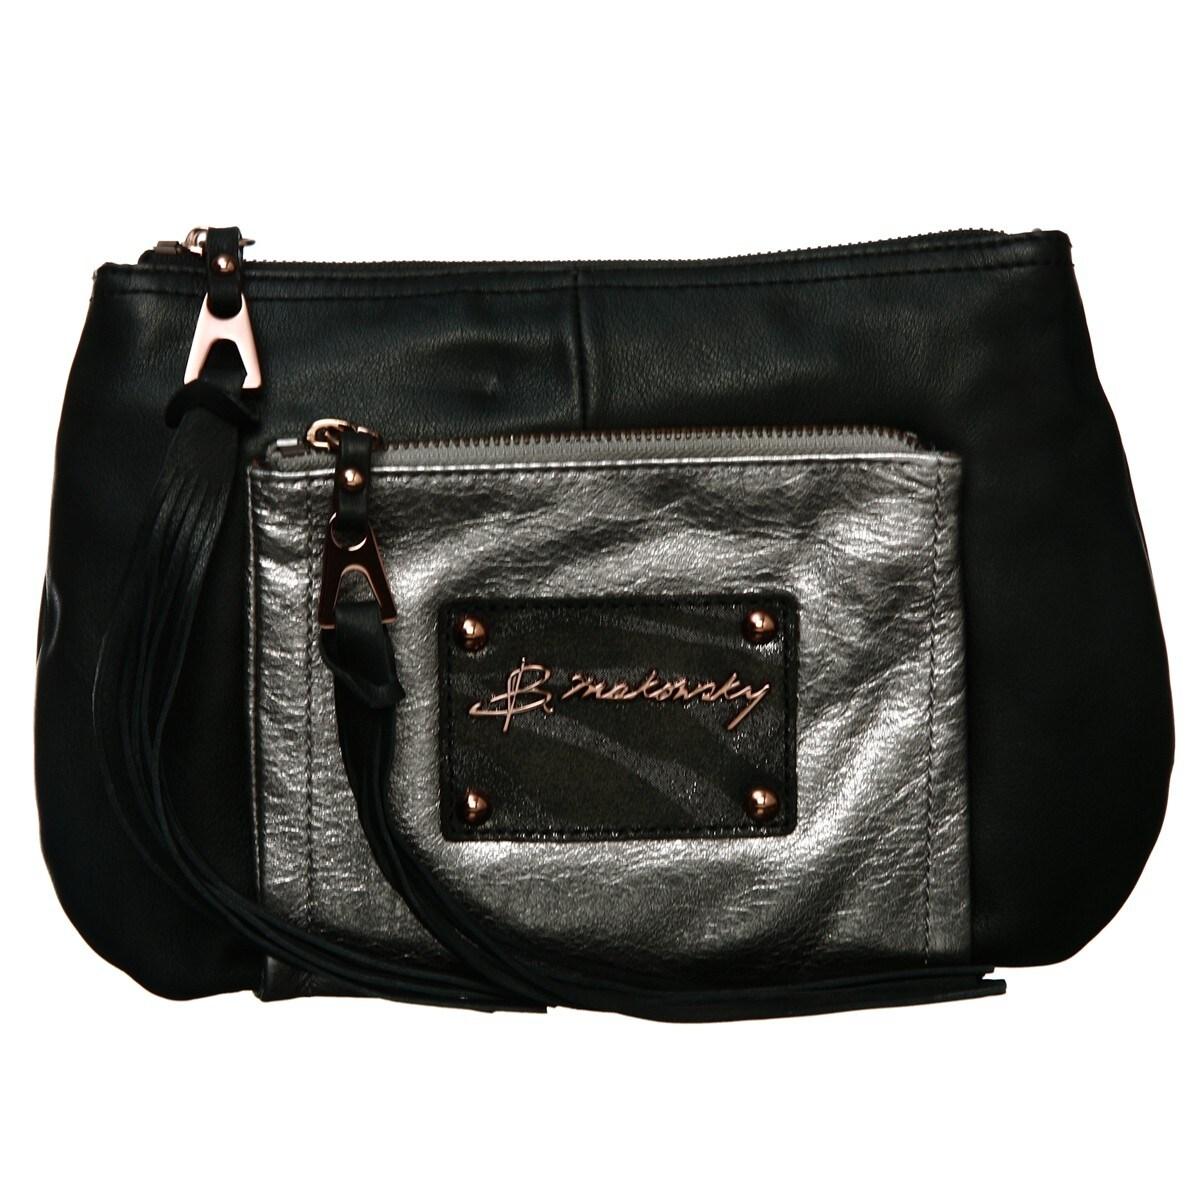 B Makowsky Rochelle Top Zip Crossbody Bag Free Shipping Today 6055735